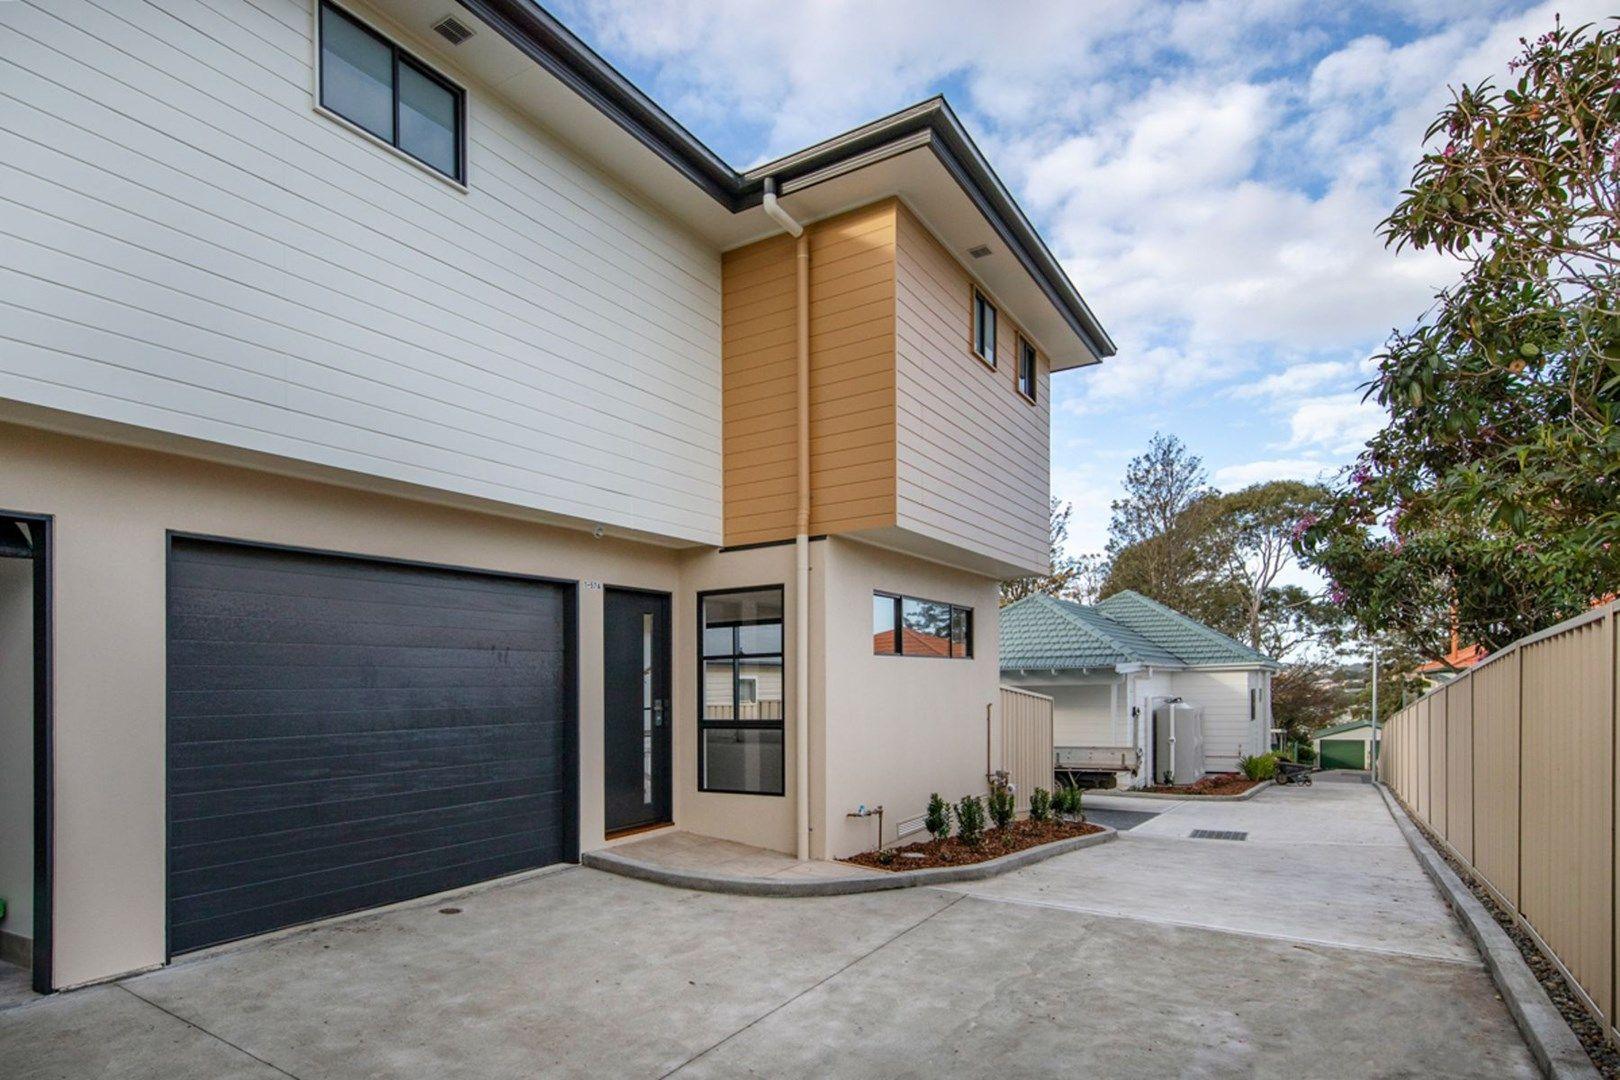 1/57a Macquarie Street, Wallsend NSW 2287, Image 0